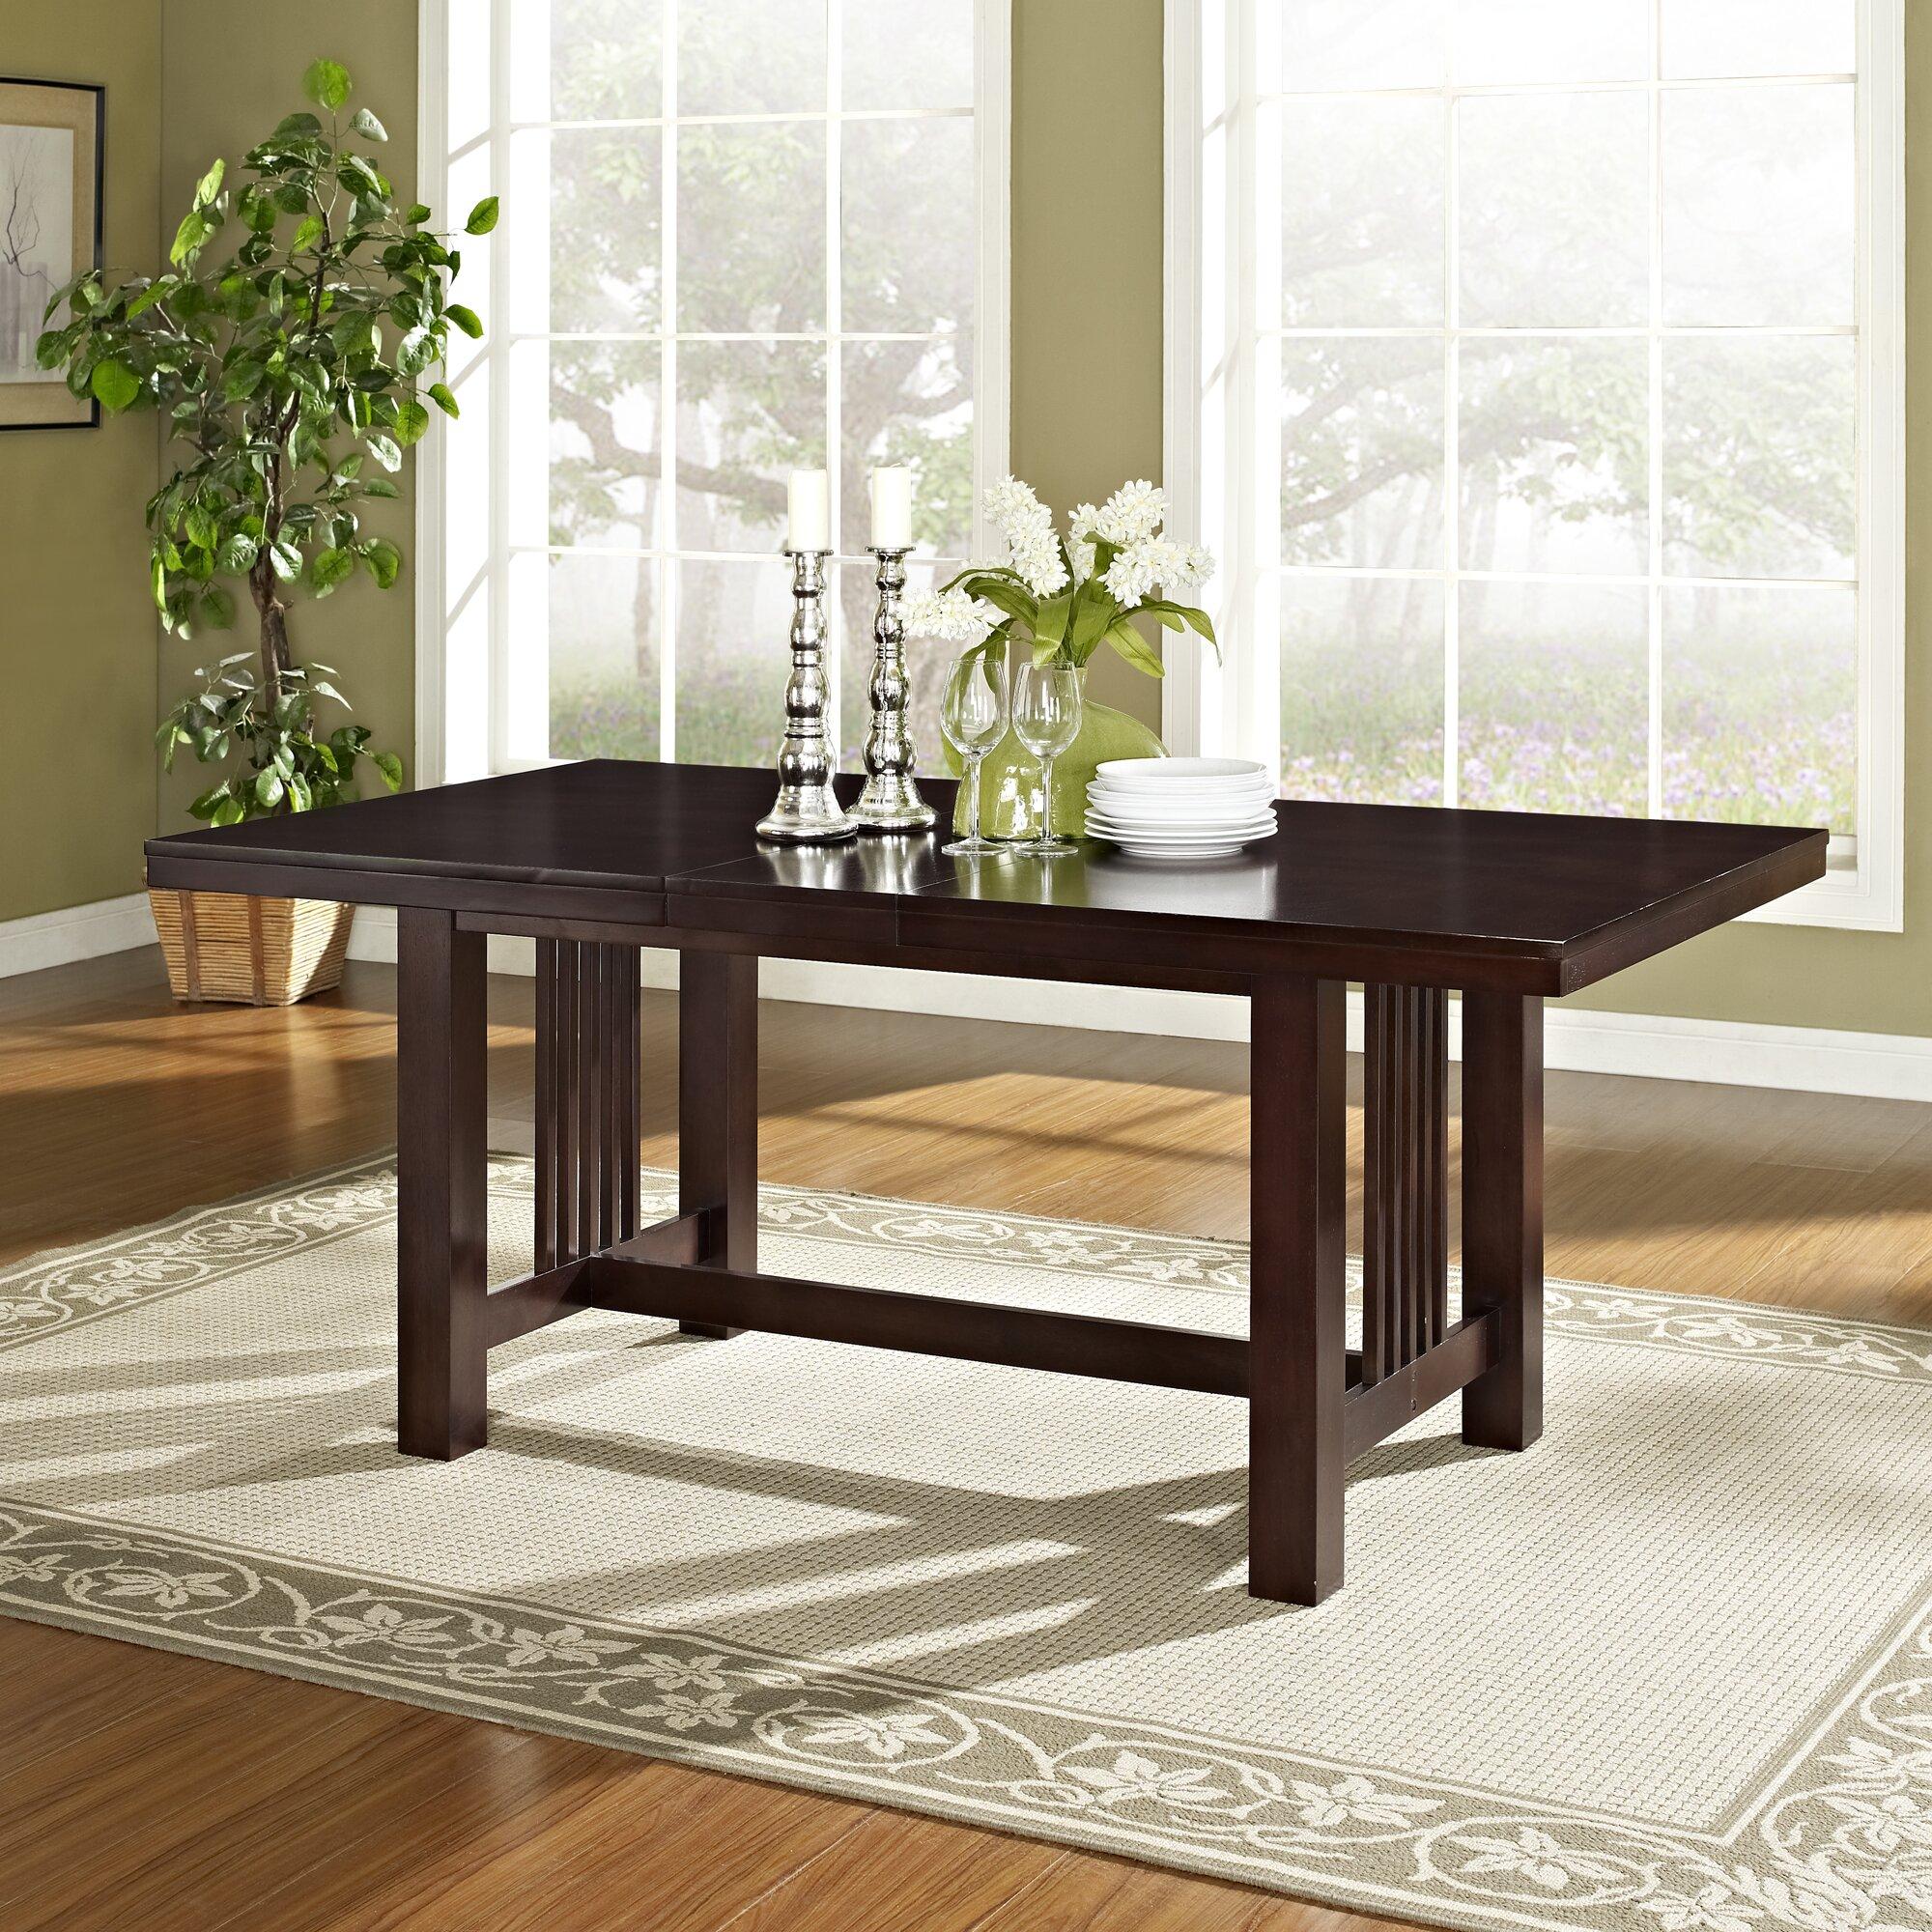 Home Loft Concepts Extendable Dining Table amp Reviews Wayfair : Extendable Dining Table GPNF2122 from www.wayfair.com size 2000 x 2000 jpeg 829kB